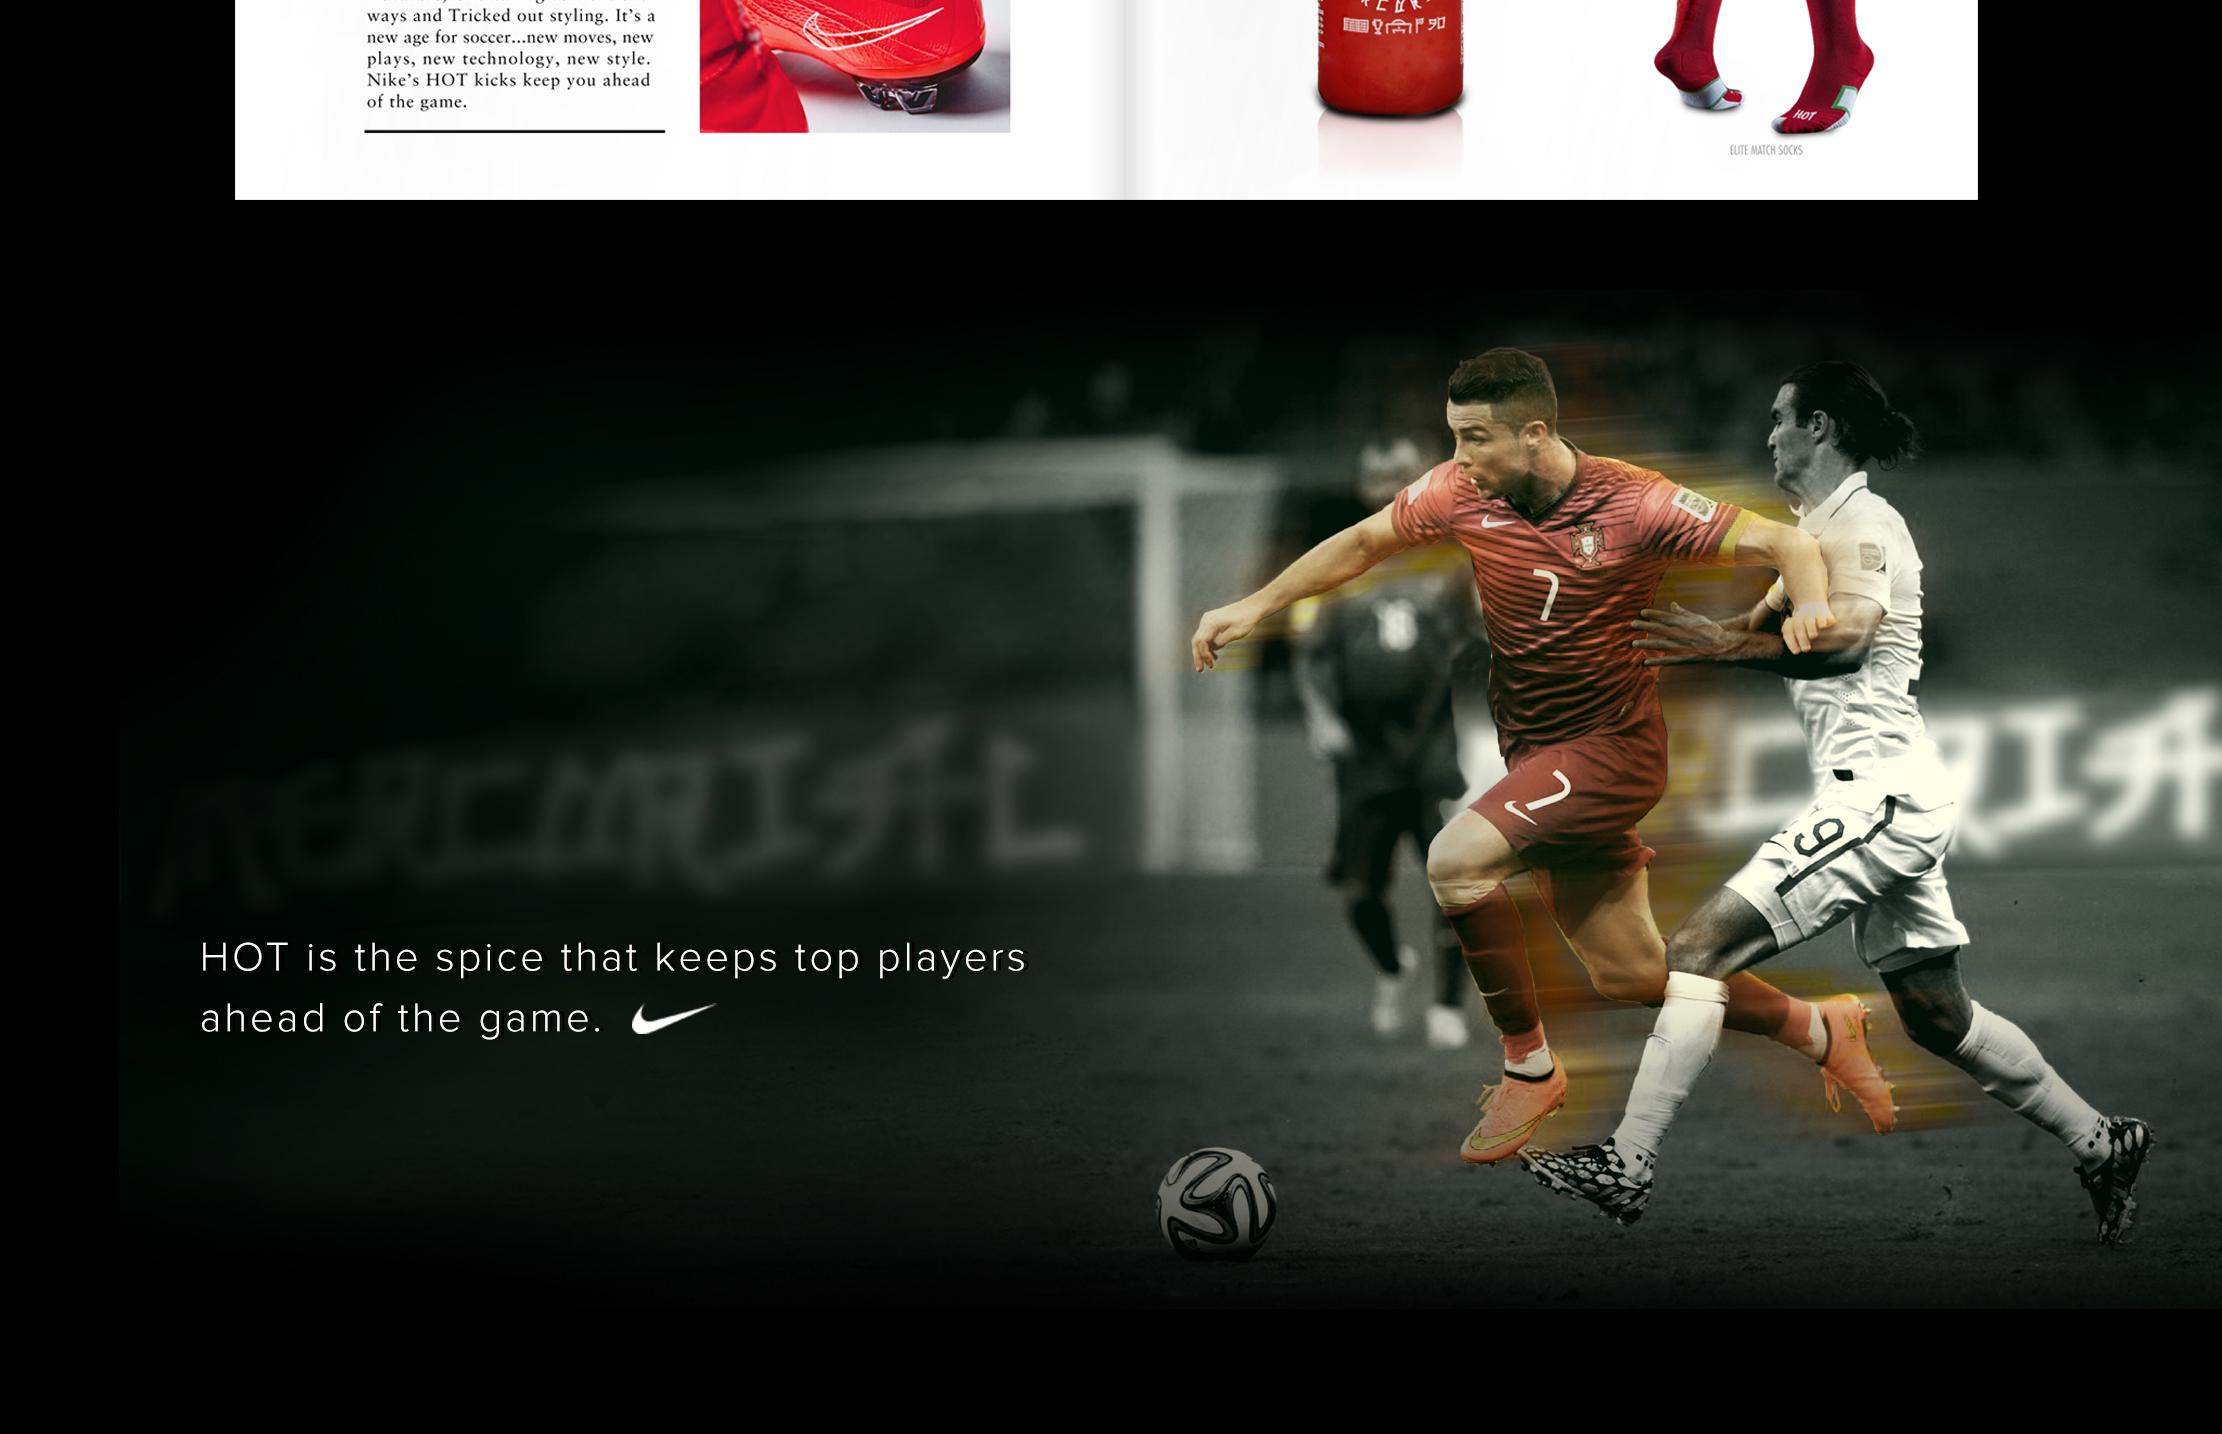 004-03-Nike_Timeline-My_Nike_Pieces-HOT.jpg